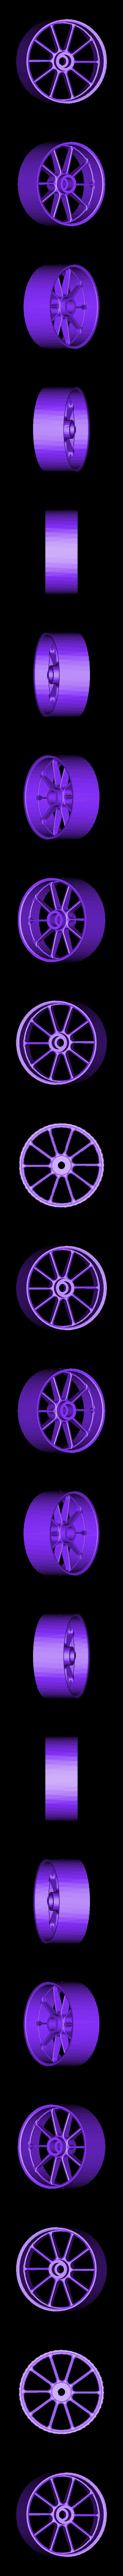 front_rim.stl Download free STL file 2016 Ducati Draxter Concept Drag Bike RC • 3D printer template, brett